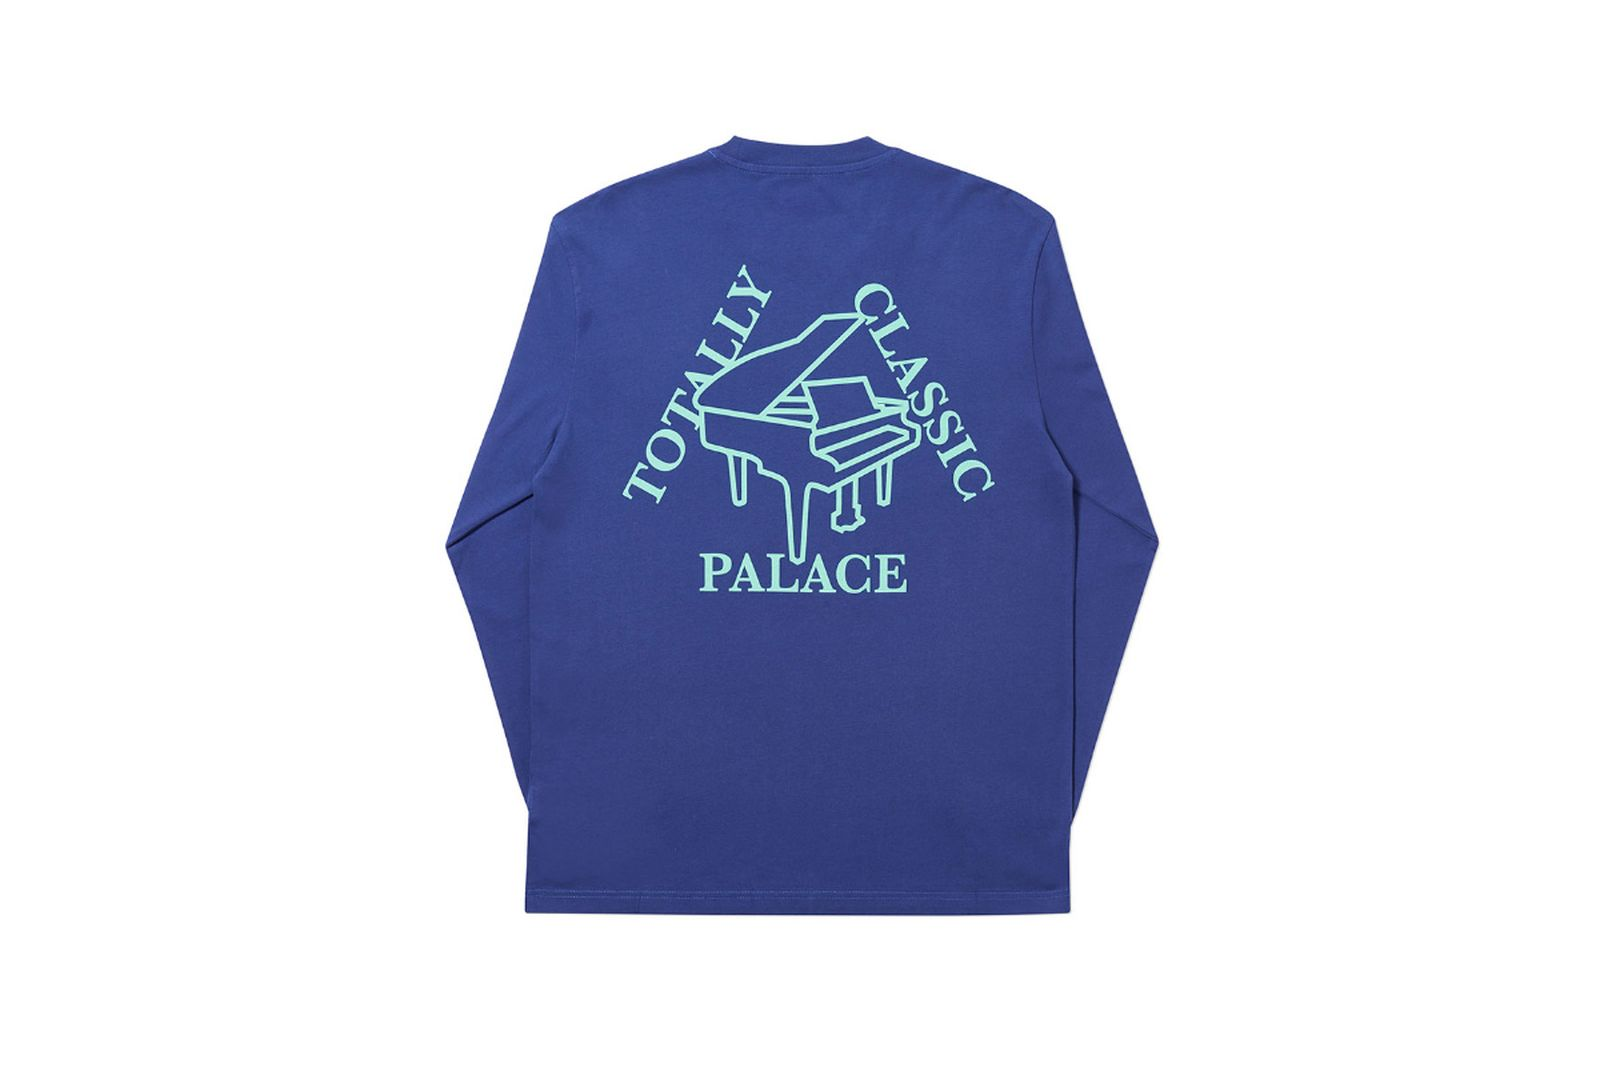 Palace 2019 Autumn Longsleeve Classic blue back